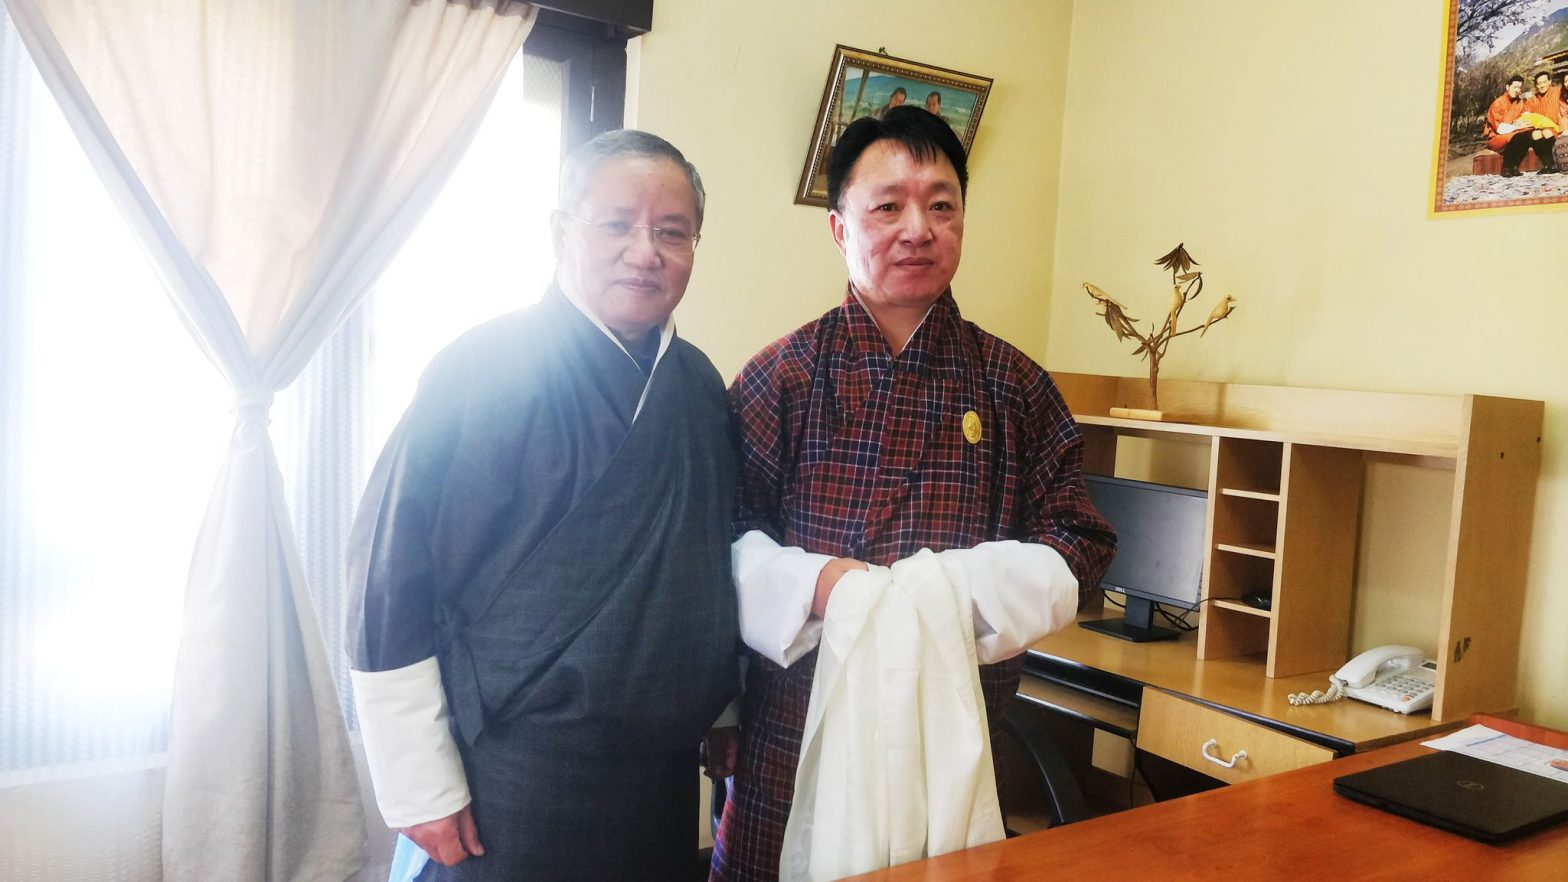 Dr. Rinzin Rinzin with the Chairperson of BTI